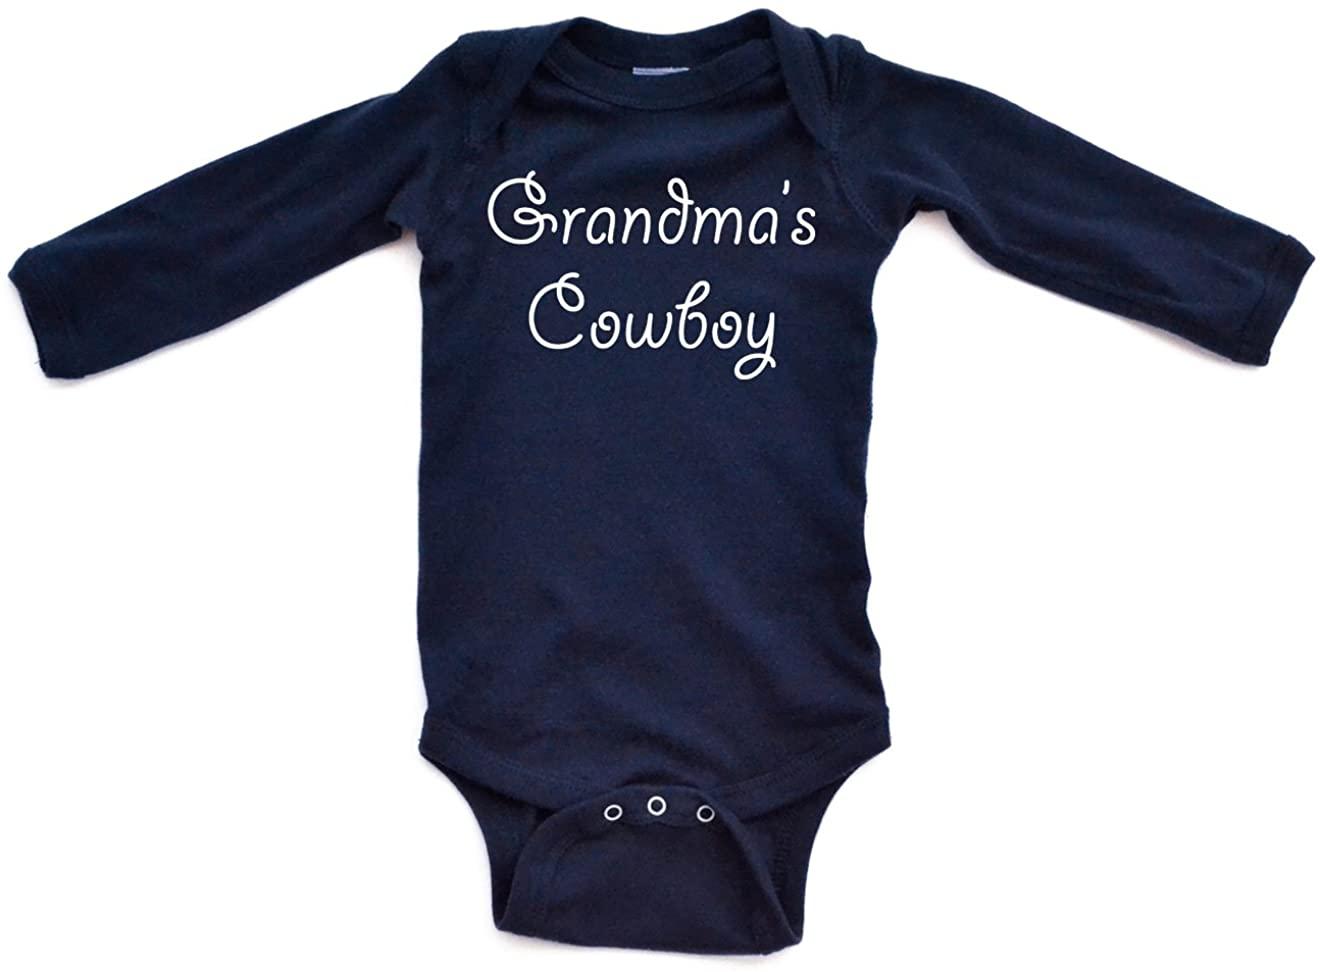 Apericots Grandma's Cowboy Adorable Cute Baby Long Sleeve Country Boy Western Creeper